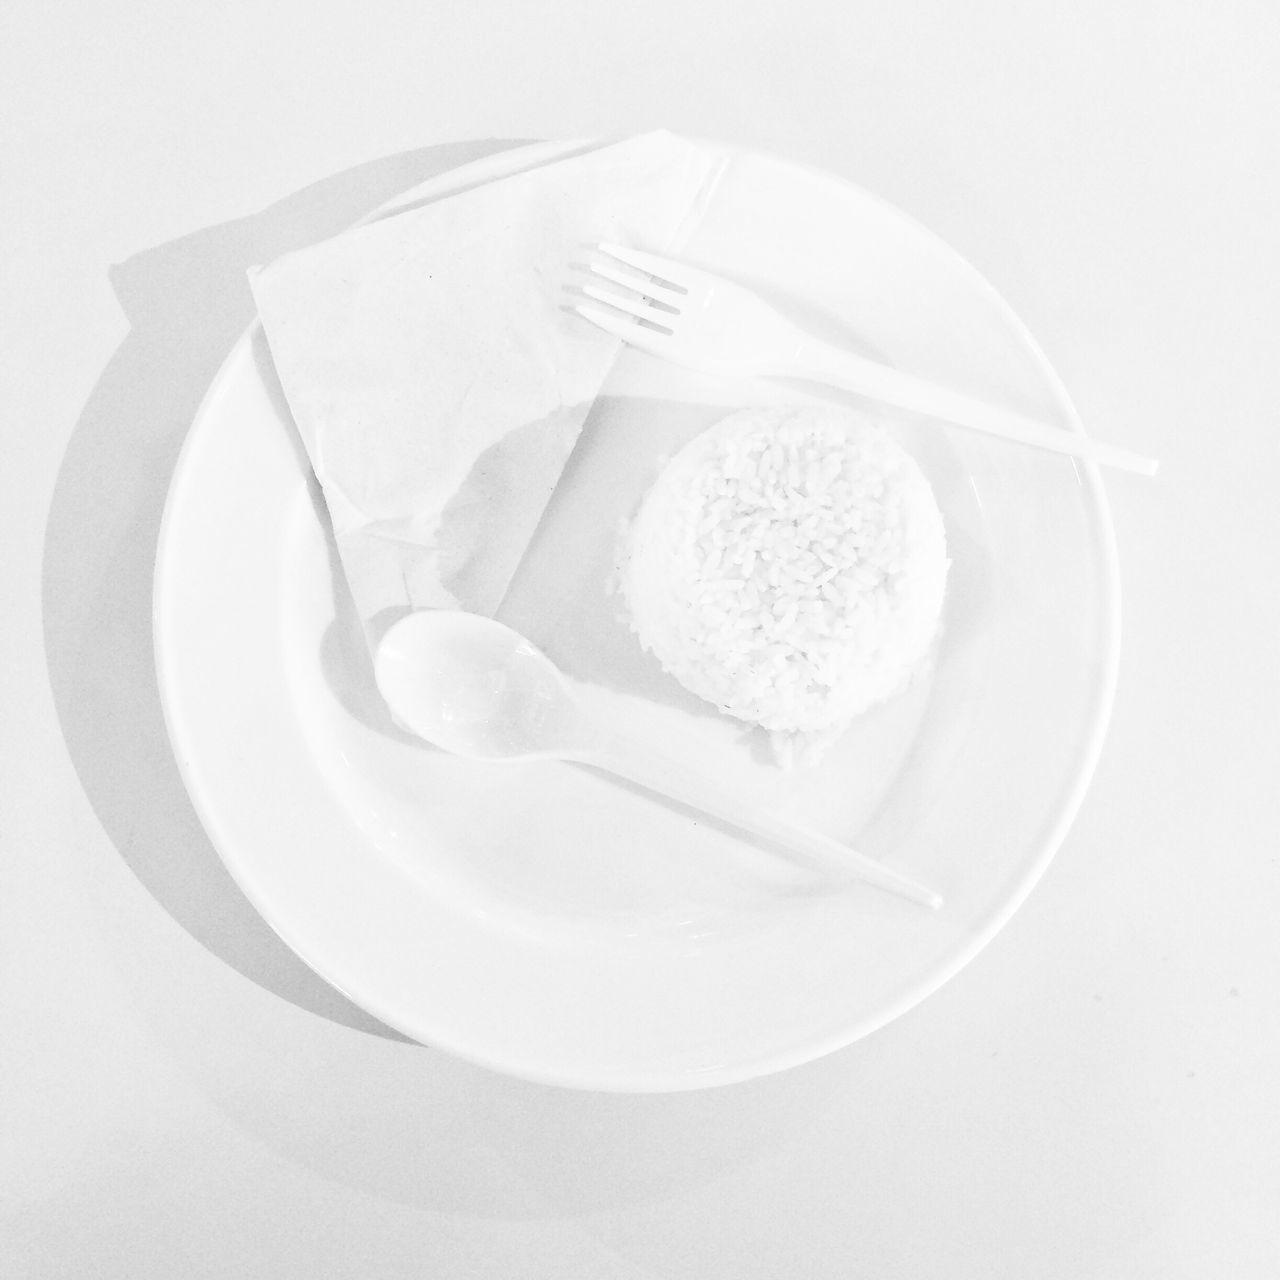 White Rice Rice White On White White Plate Food Cooking Blackandwhite